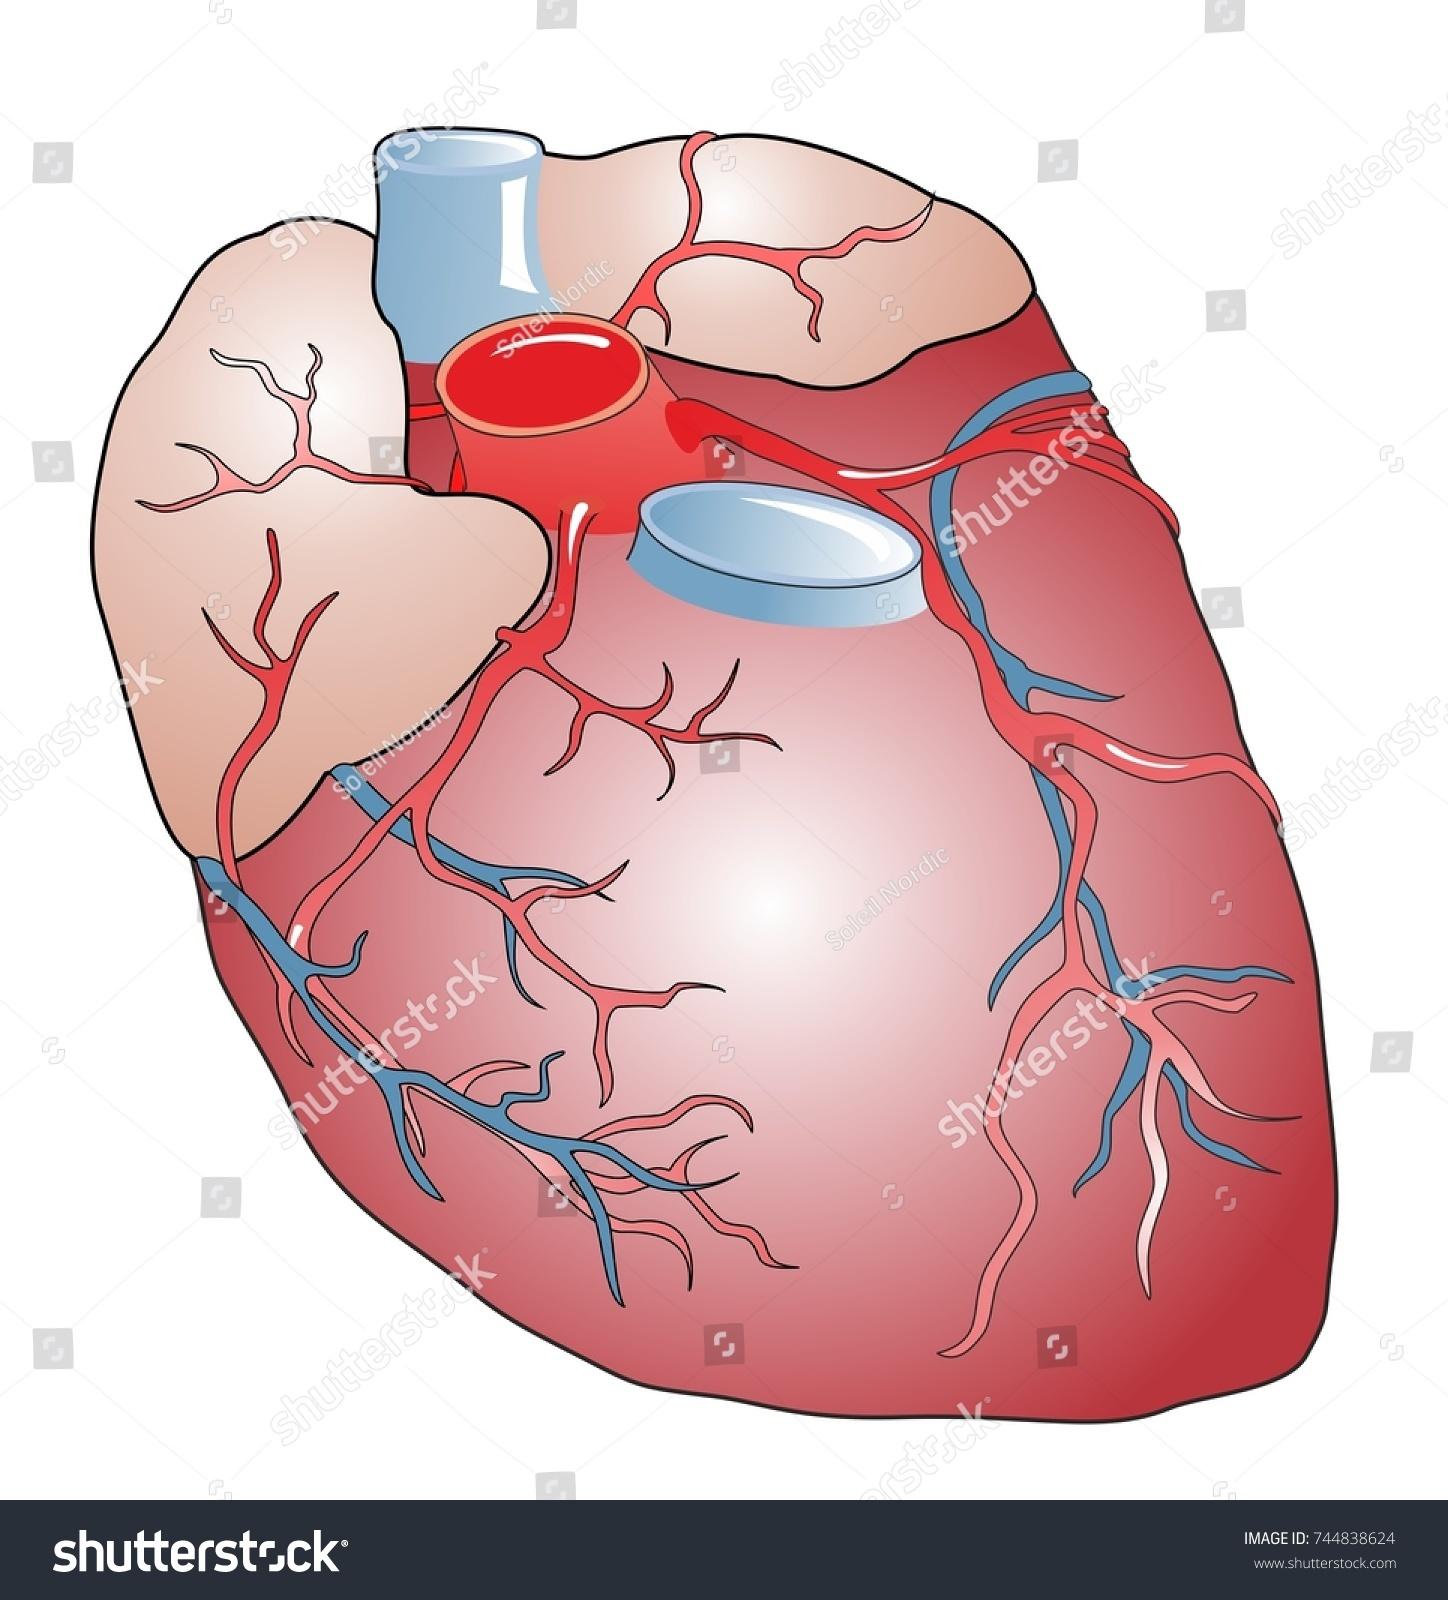 Anatomy Healthy Human Heart Heart Muscular Stock Illustration